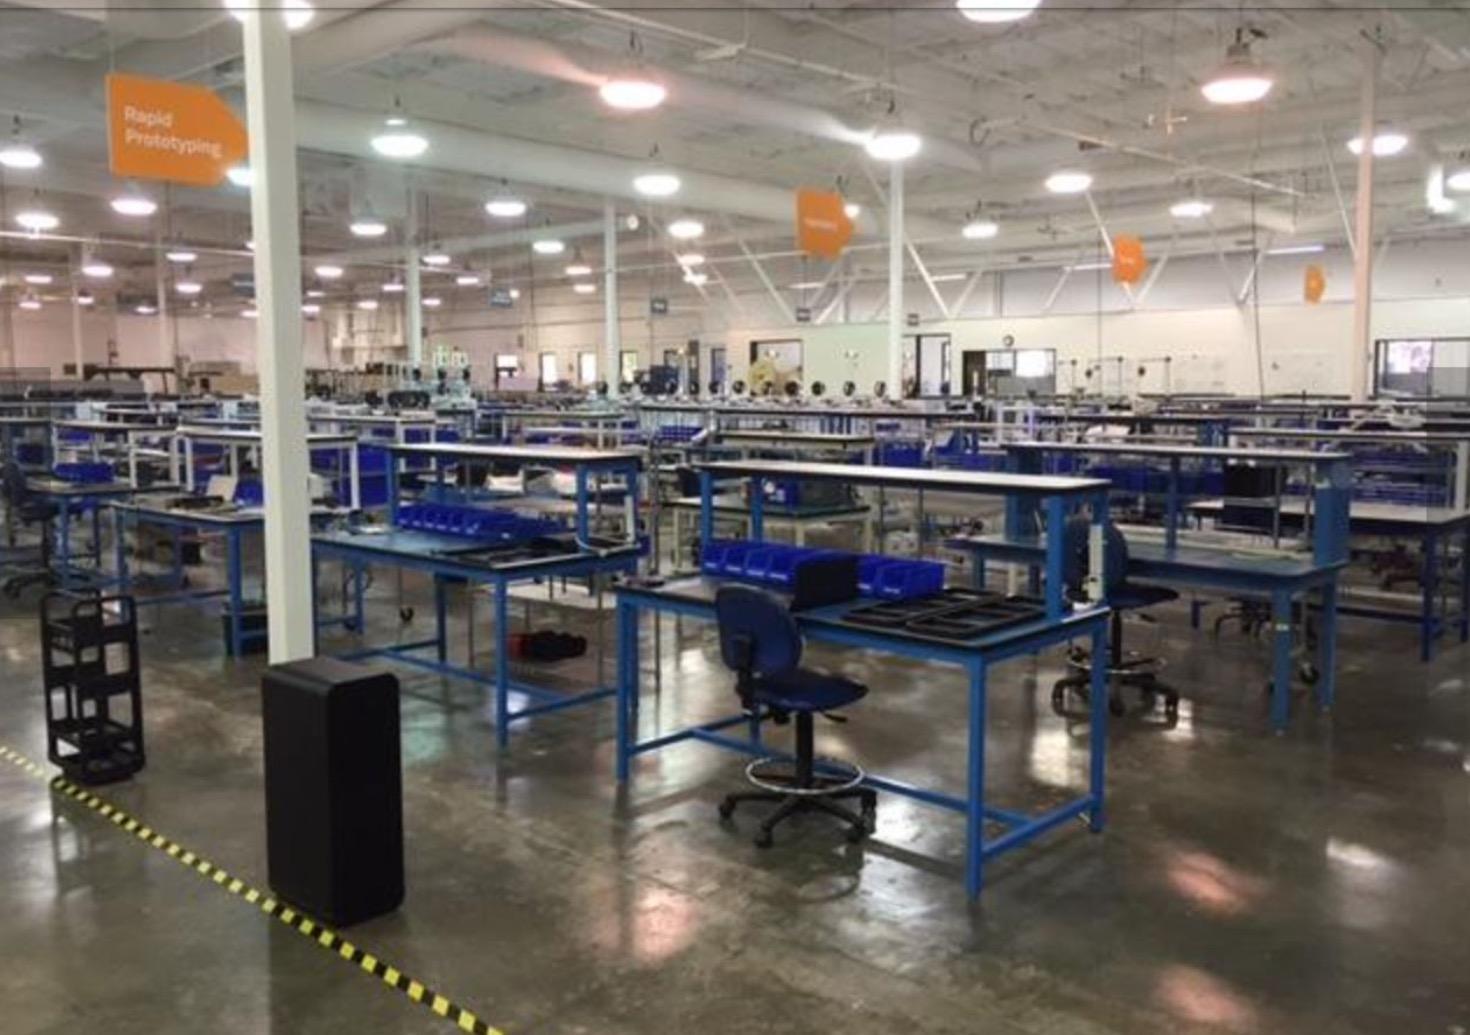 A peek inside BriteLab, where Type A Machines will have their desktop 3D printers built